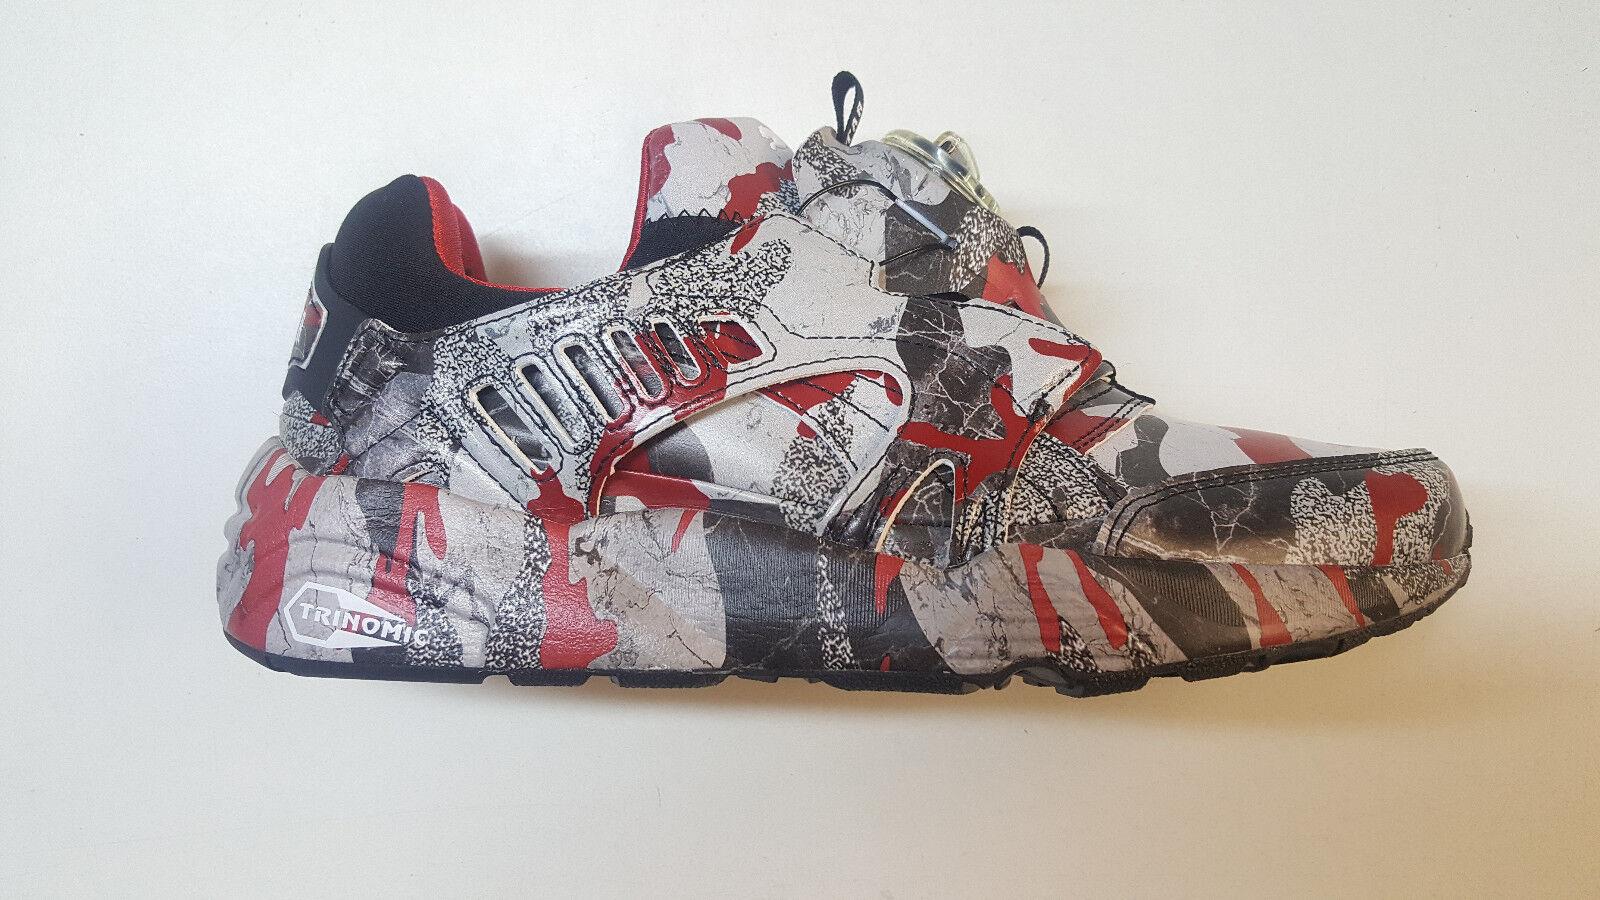 Puma Disc Blaze Camo x zapatos trapstar Londres rojo negro zapatos x de hombre 361647-01 2-68 8aef45